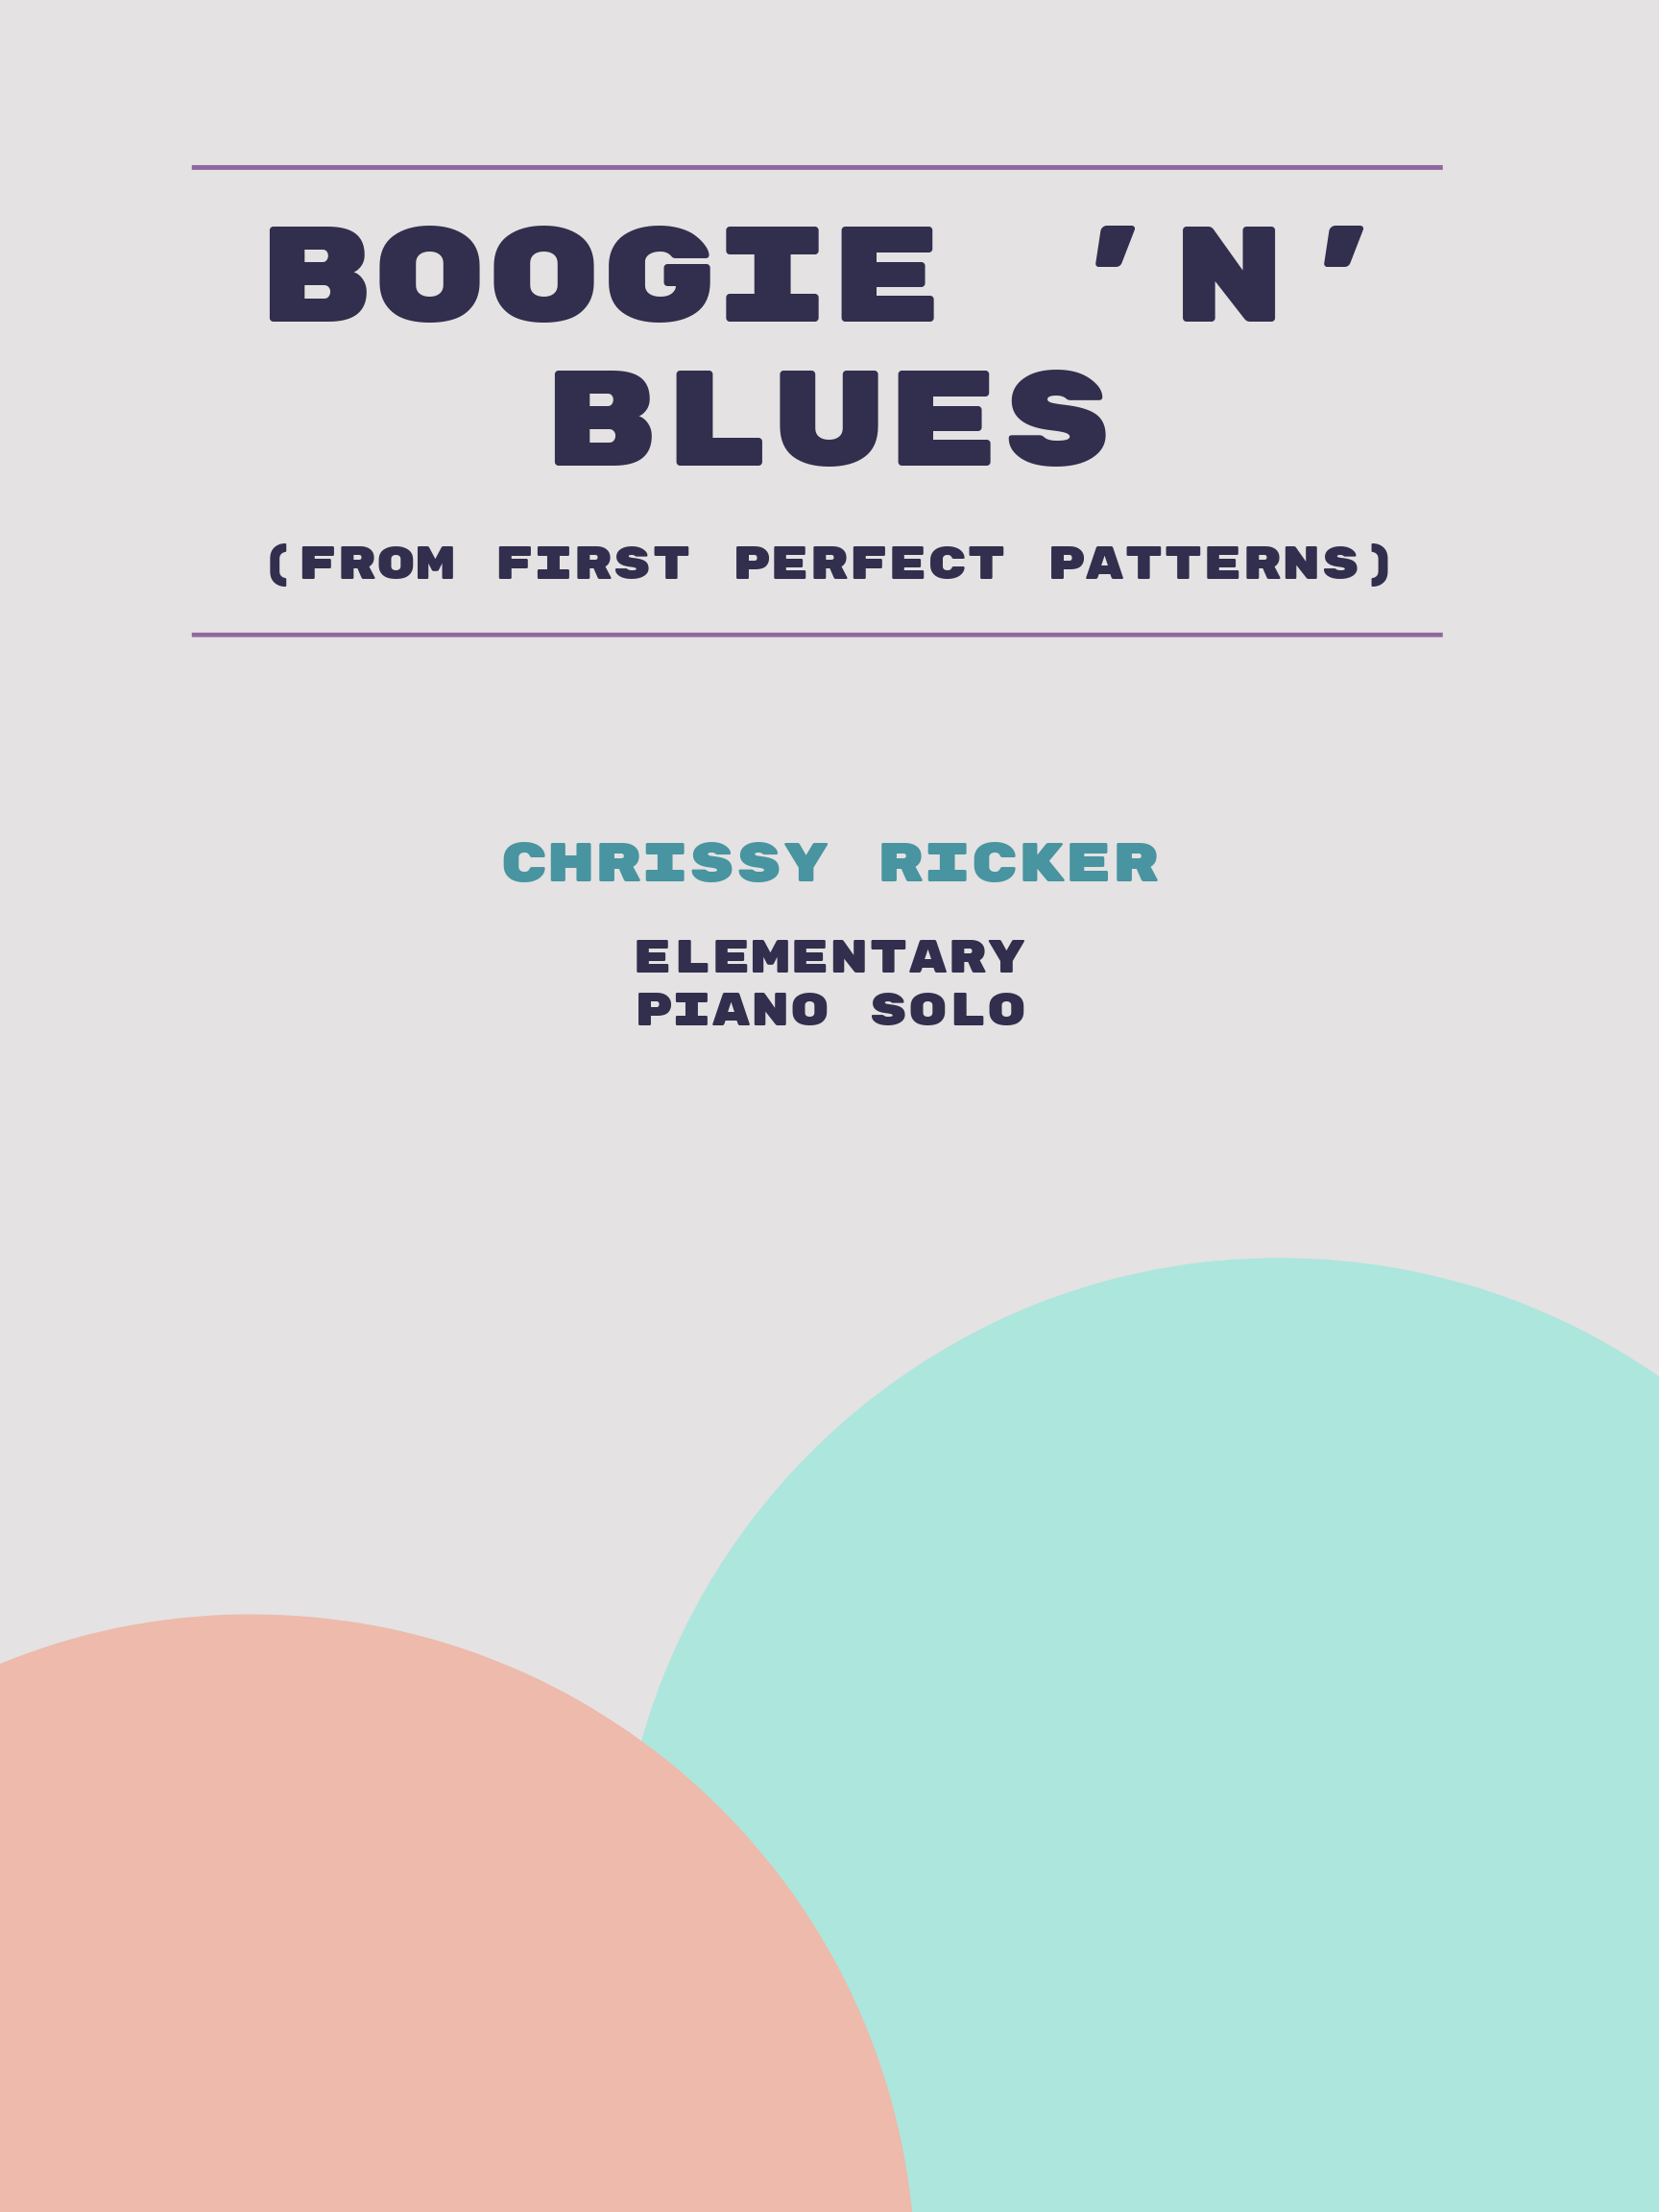 Boogie 'n' Blues by Chrissy Ricker